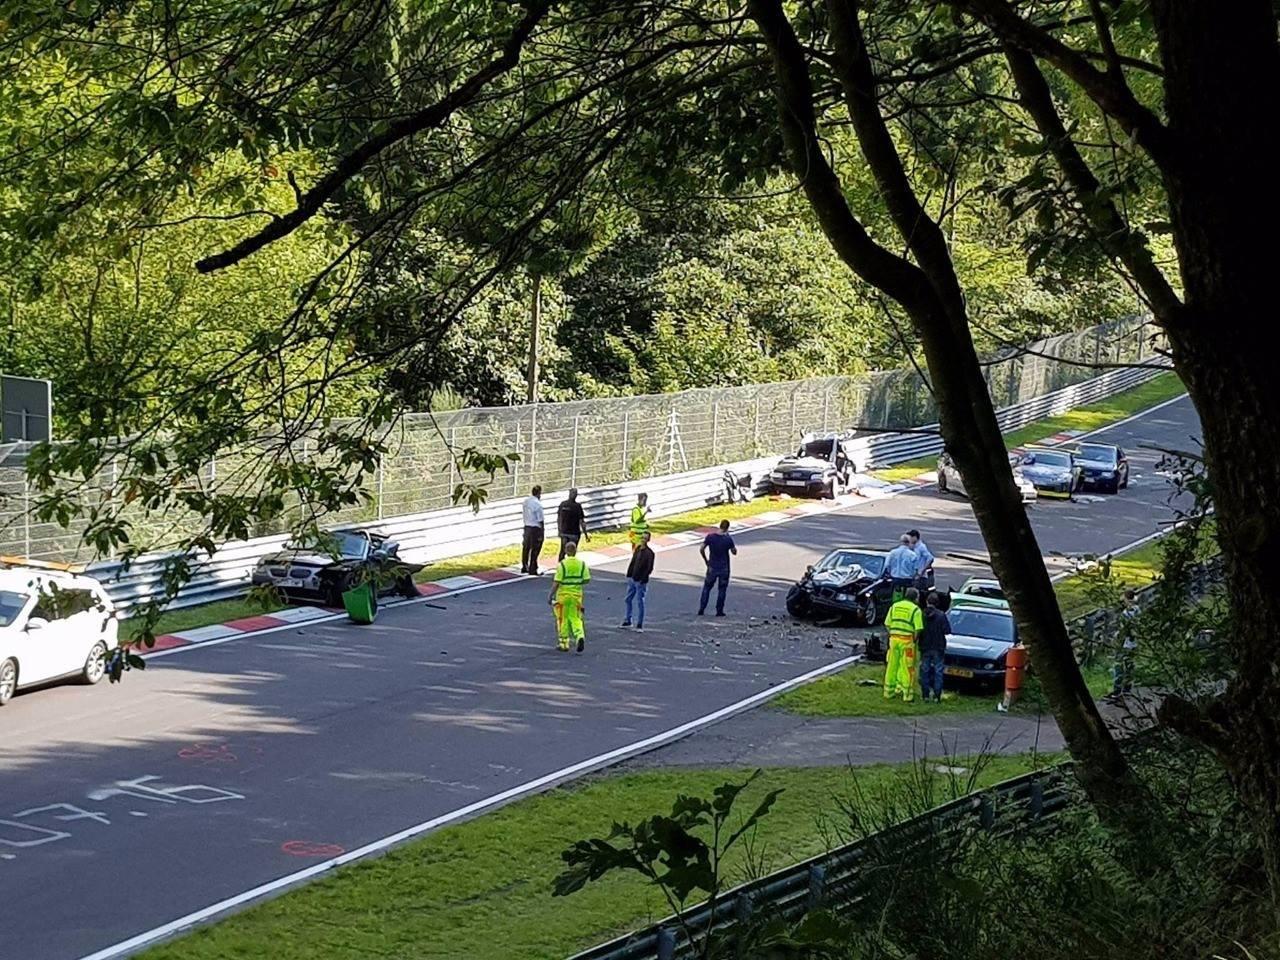 Nurburgring crash august 2017 (4)